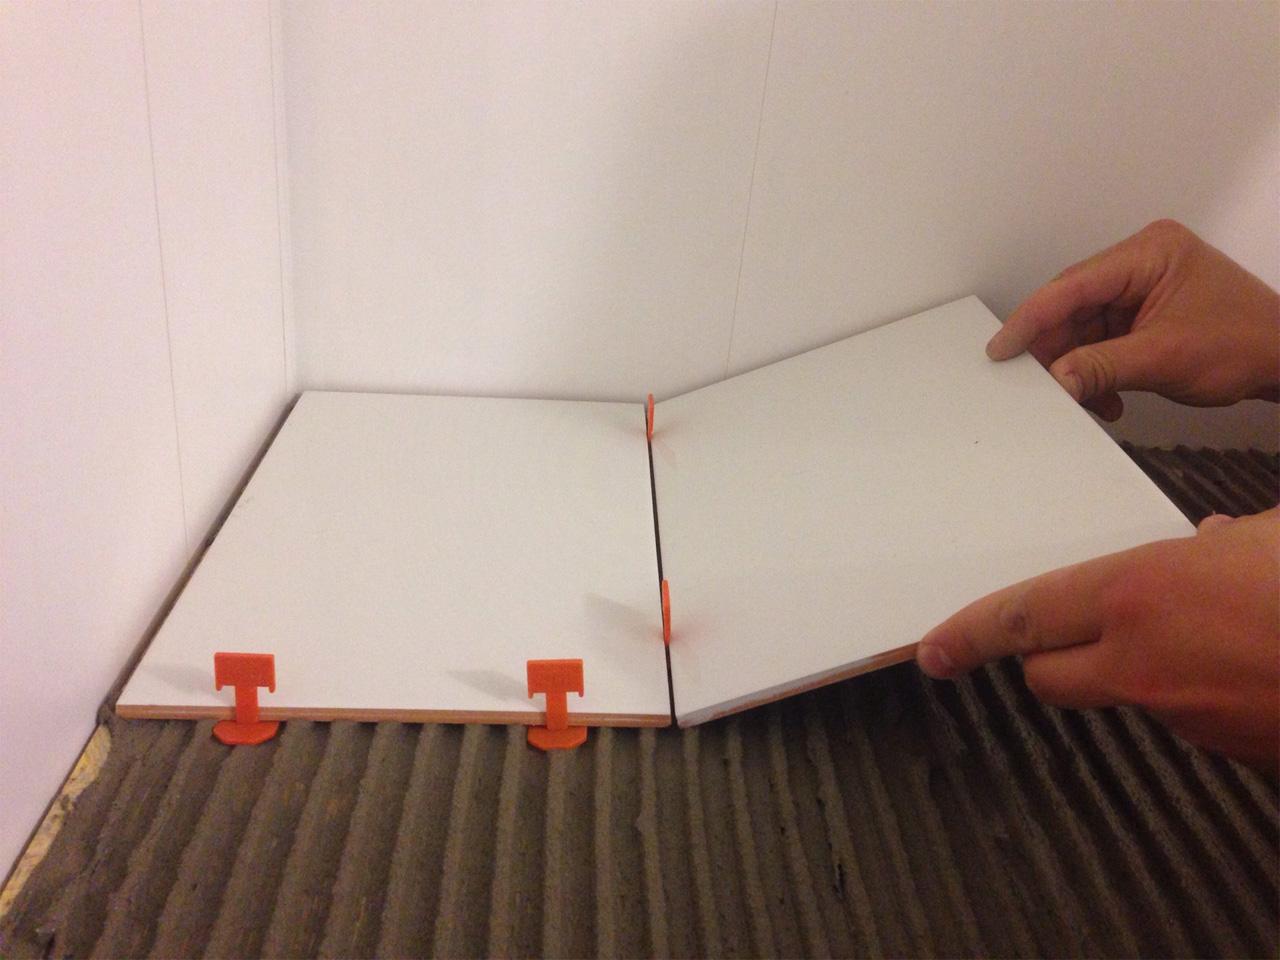 крестики для ровной укладки плитки